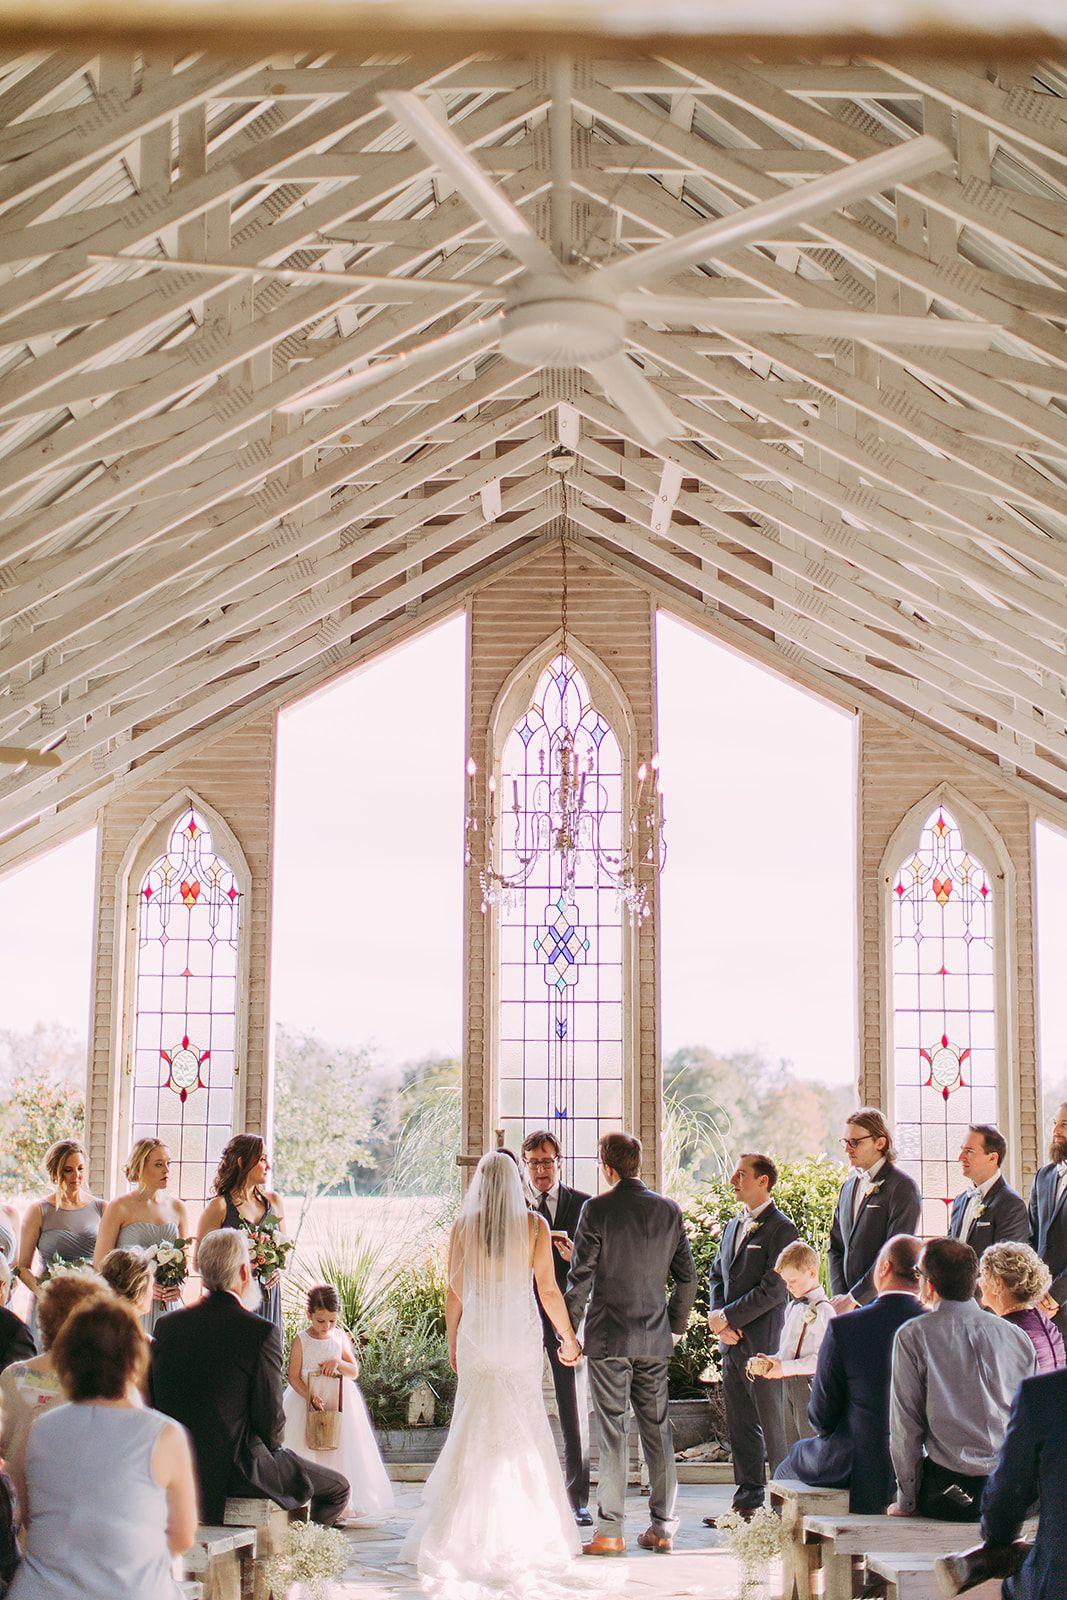 Gruene Estate S Historic Open Air Wedding Chapel Rustic Wedding Chapel Inspiration Wedding Chapel Inspira Gruene Estate Wedding Wedding Venues Chapel Wedding